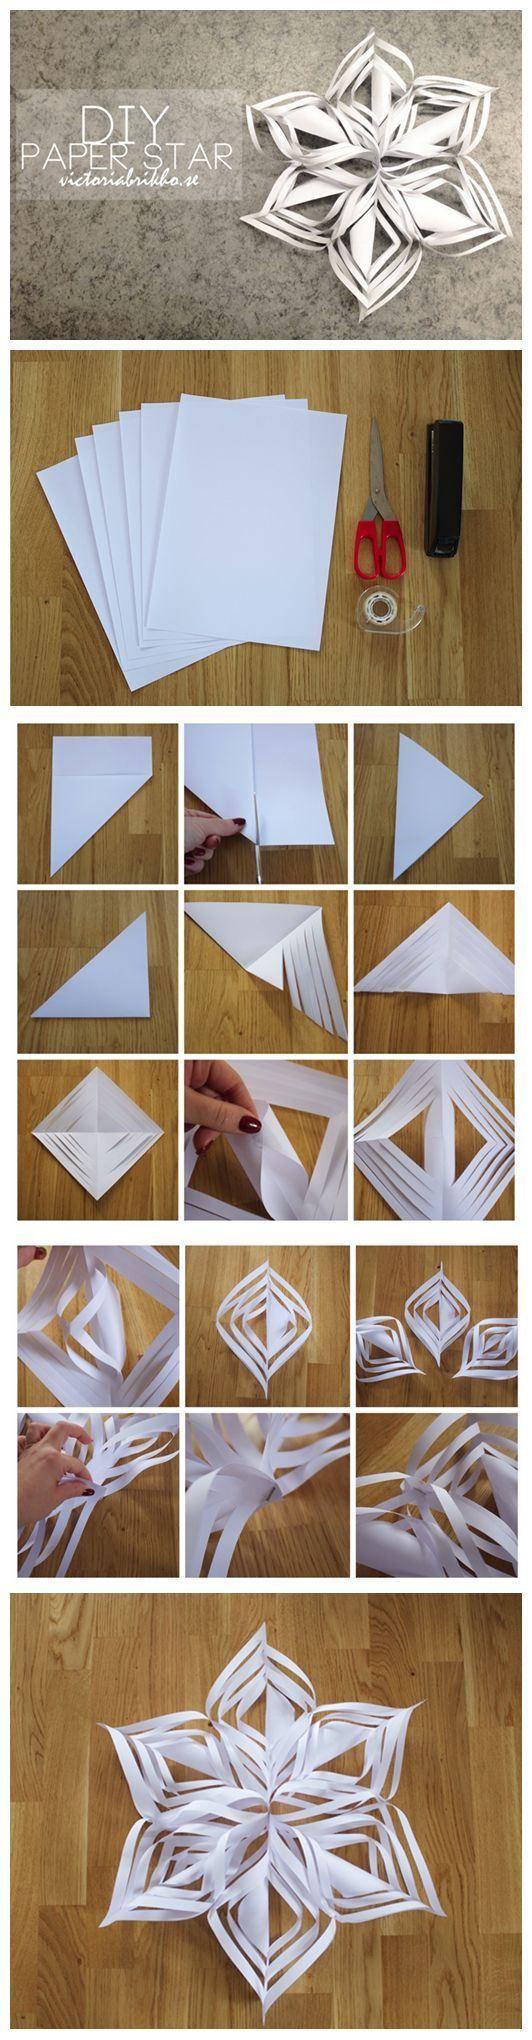 Diy paper star diy crafts pinterest for How to make a big paper star